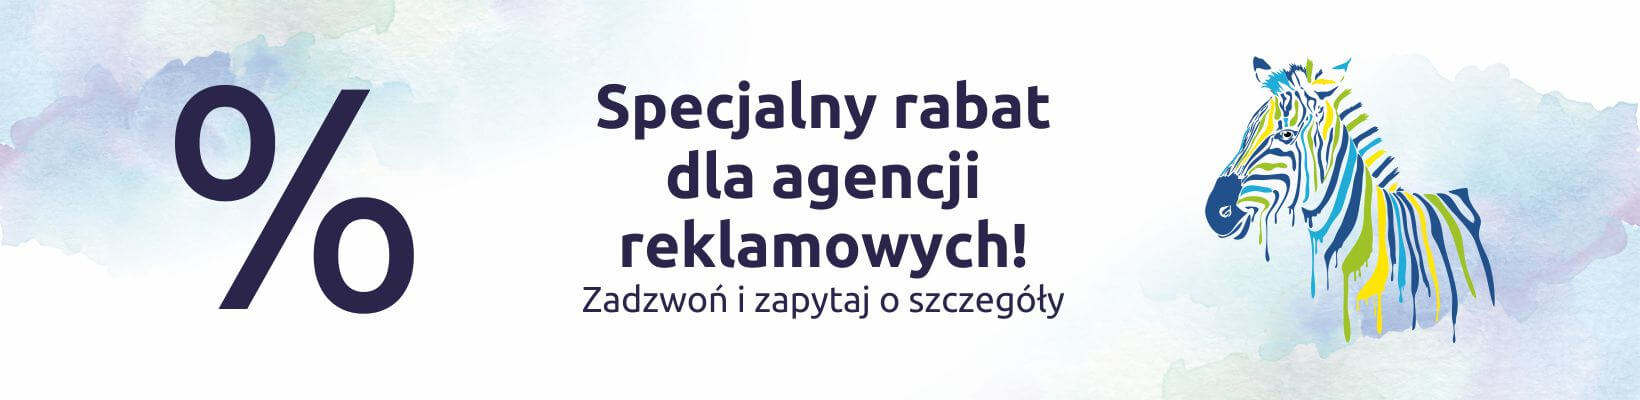 baner-rabaty-agencja-reklamowa